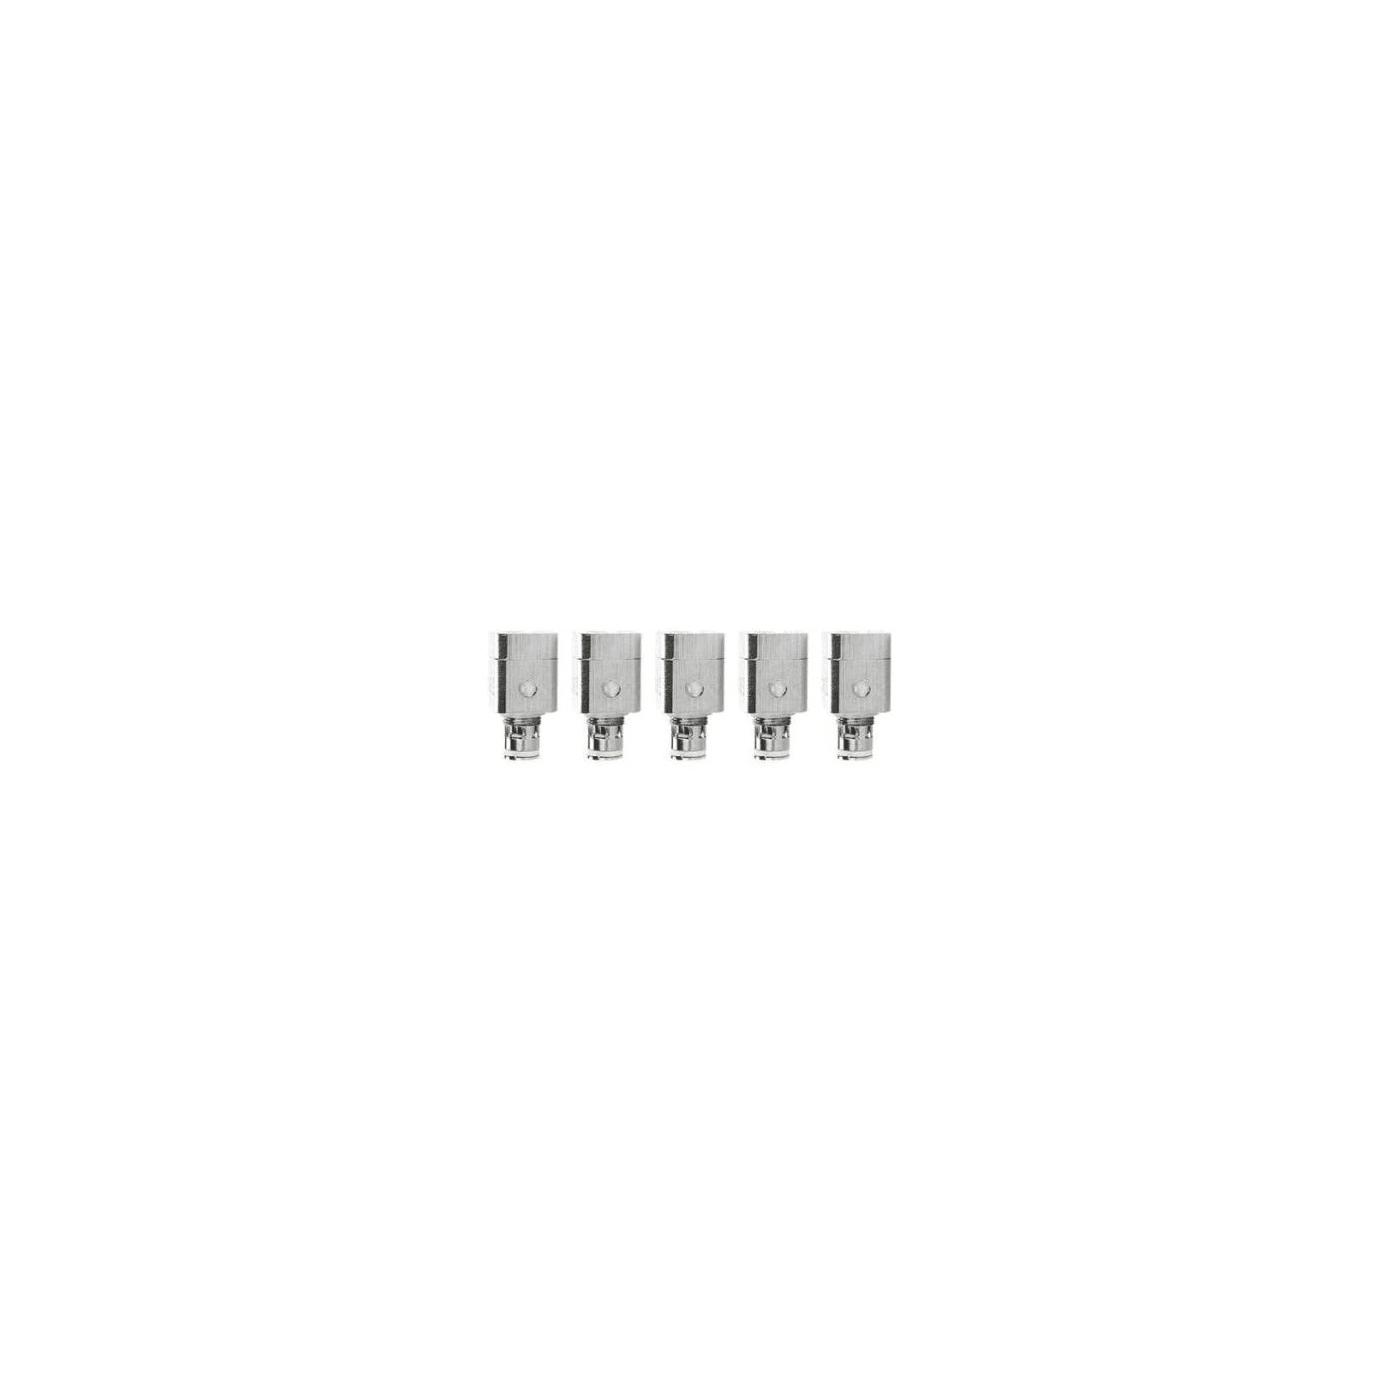 VaporFi Volt OCC Replacement Coil - 5 Pack